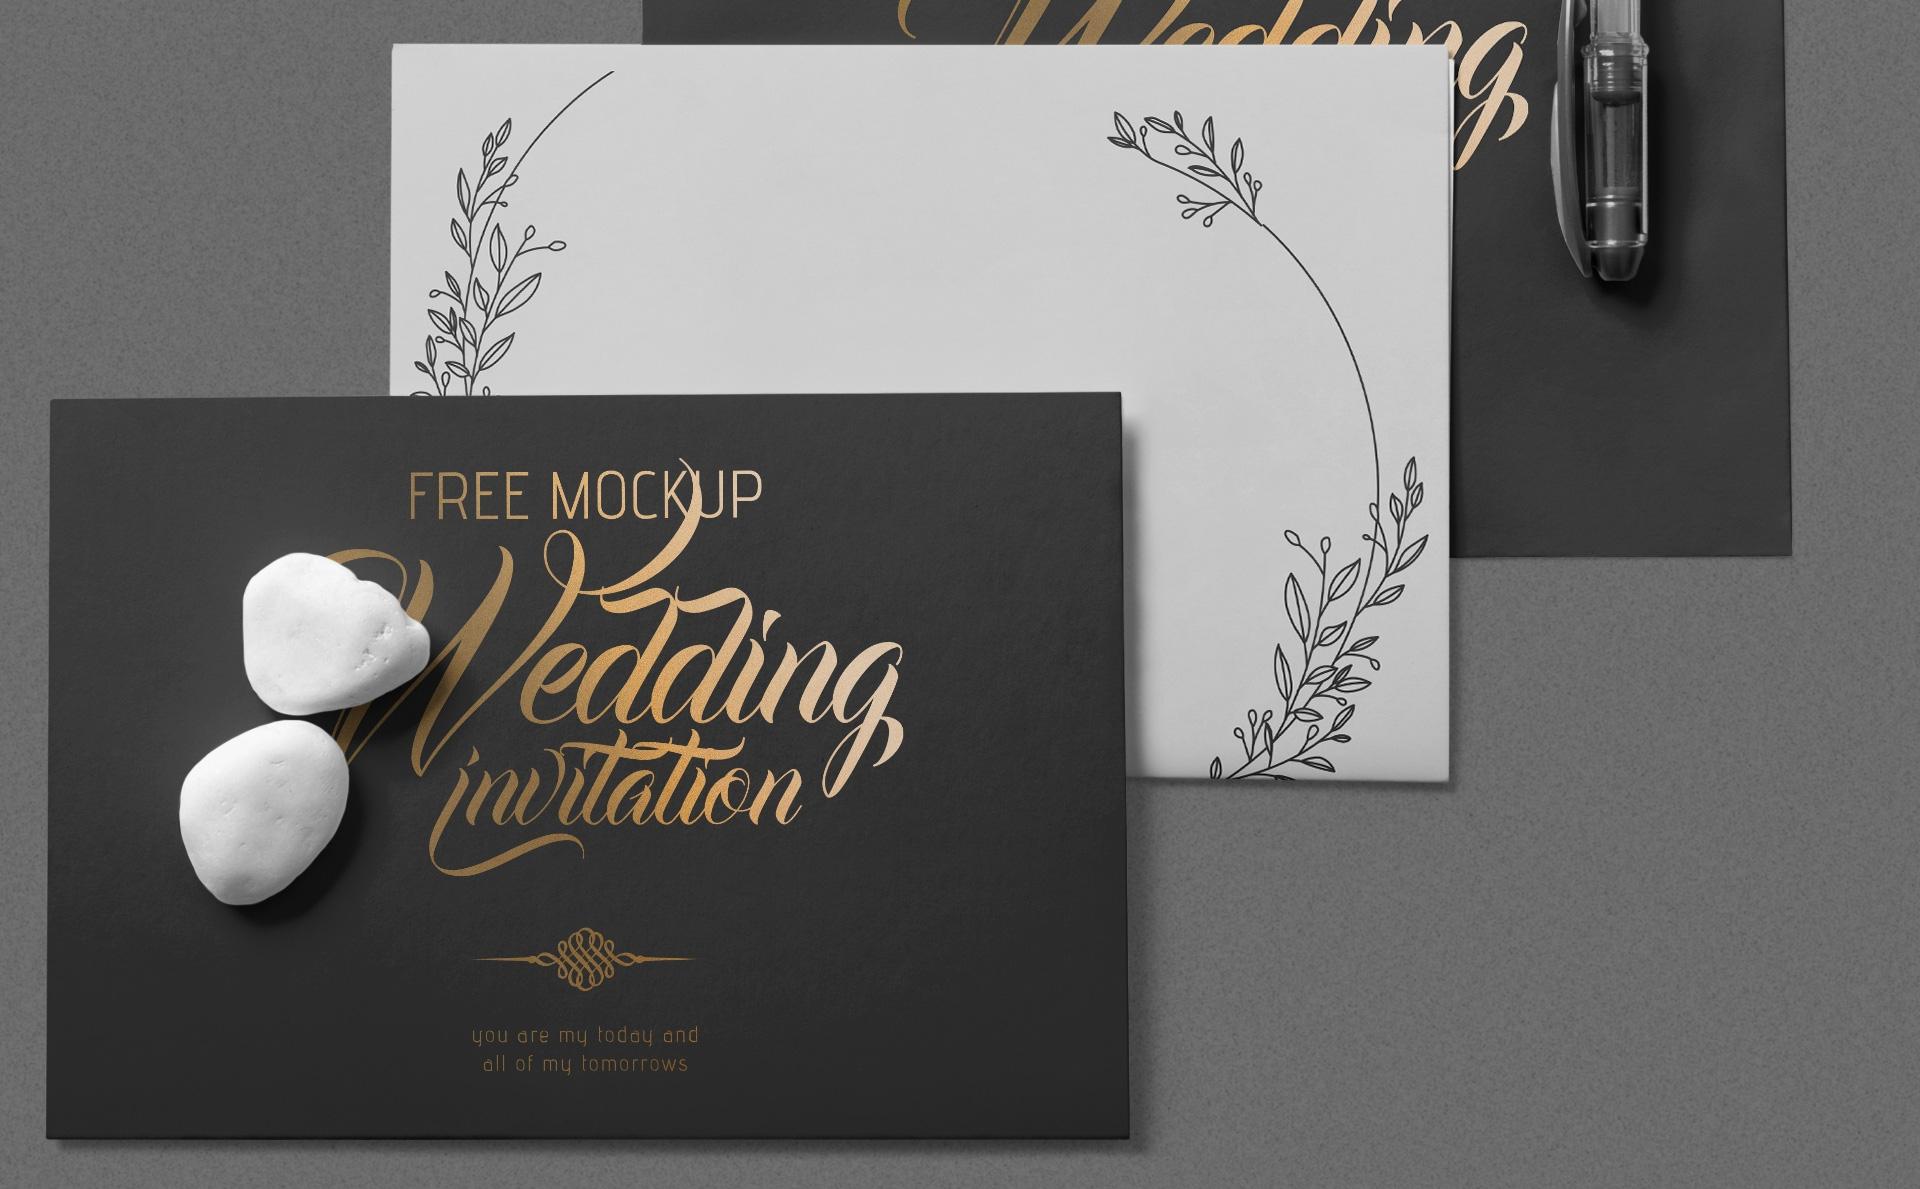 优雅唯美的婚礼邀请卡信封样机Elegant Wedding Invitation Mockup